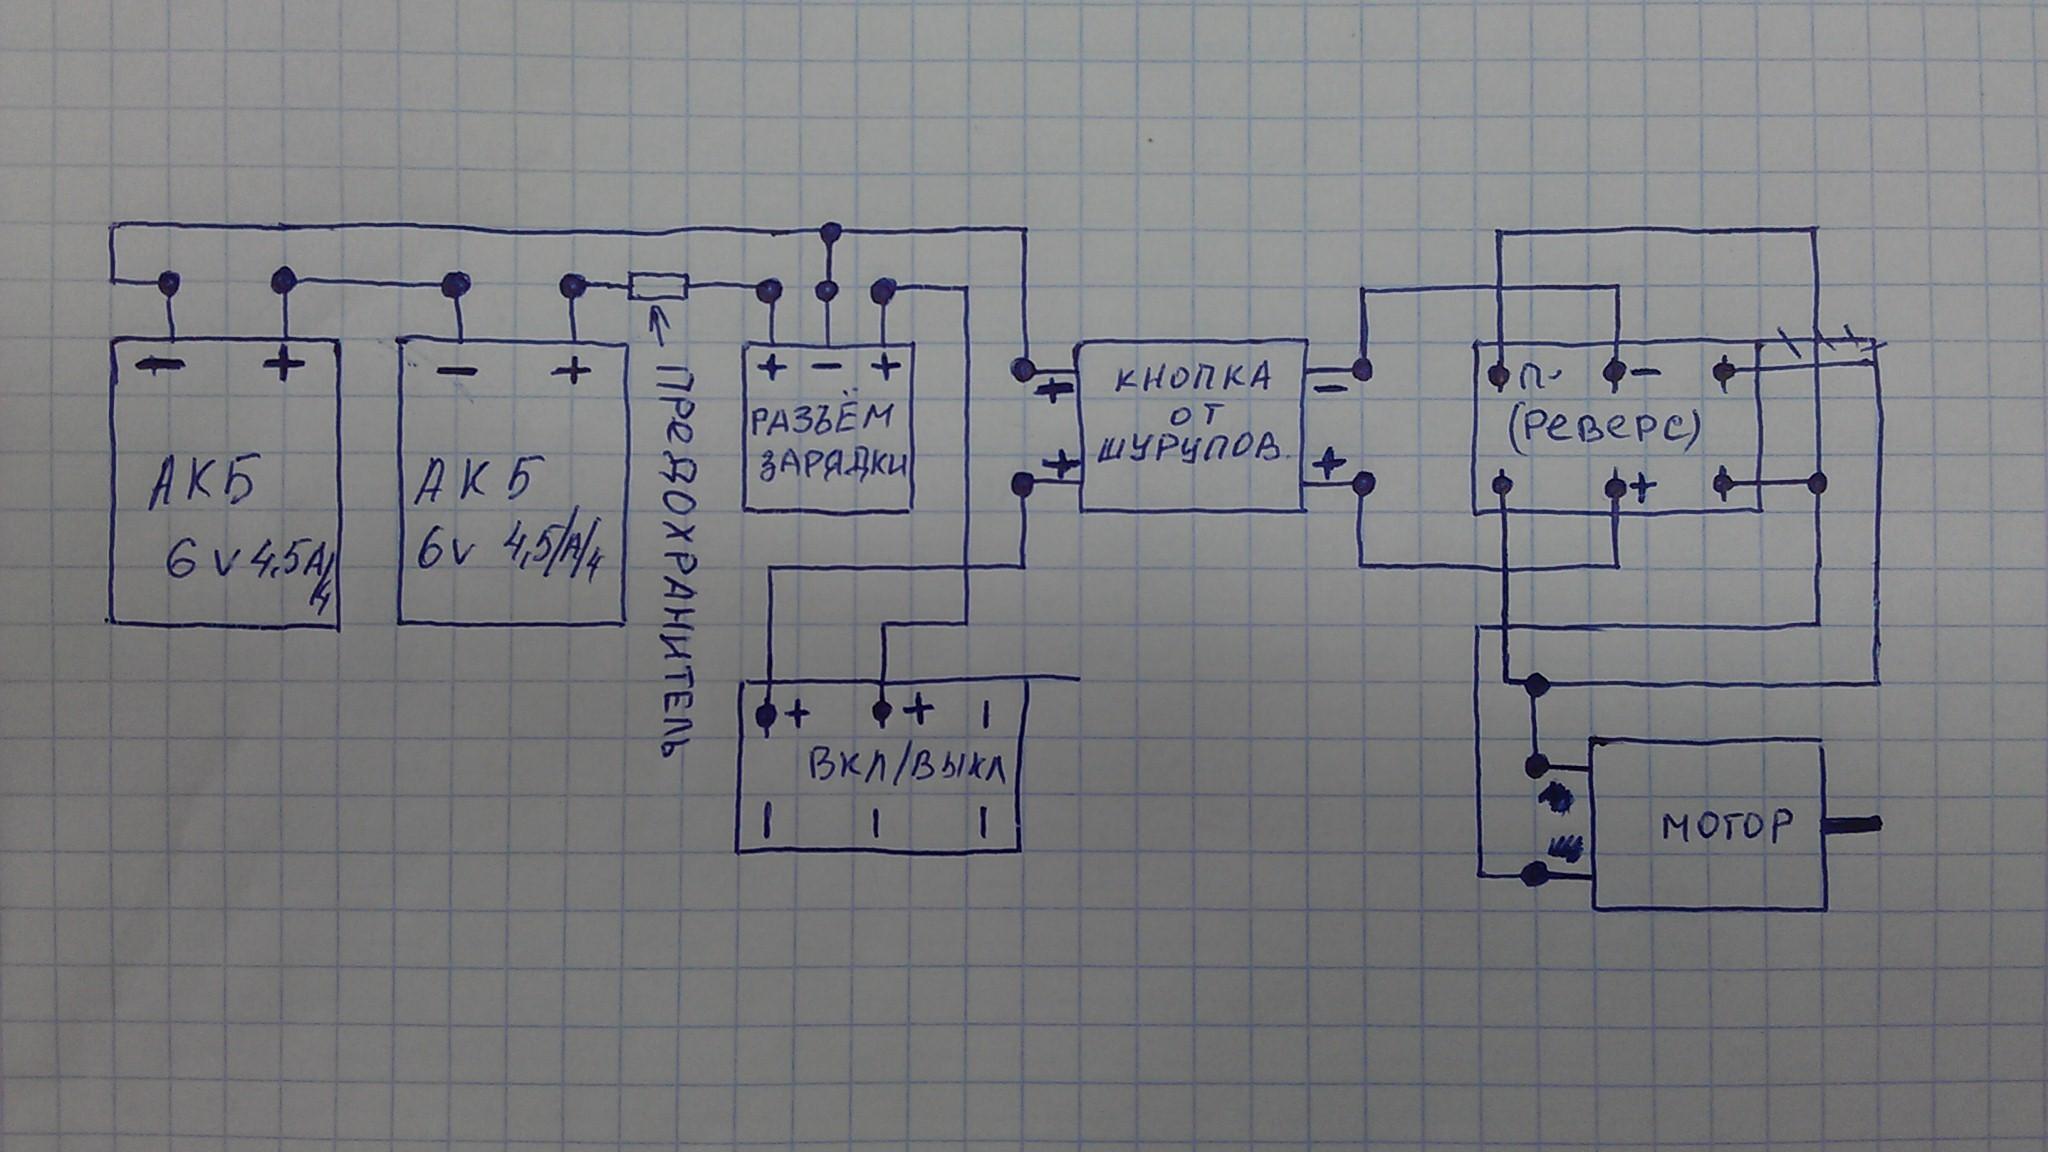 электросхема детского электромобиля с двумя аккумуляторами